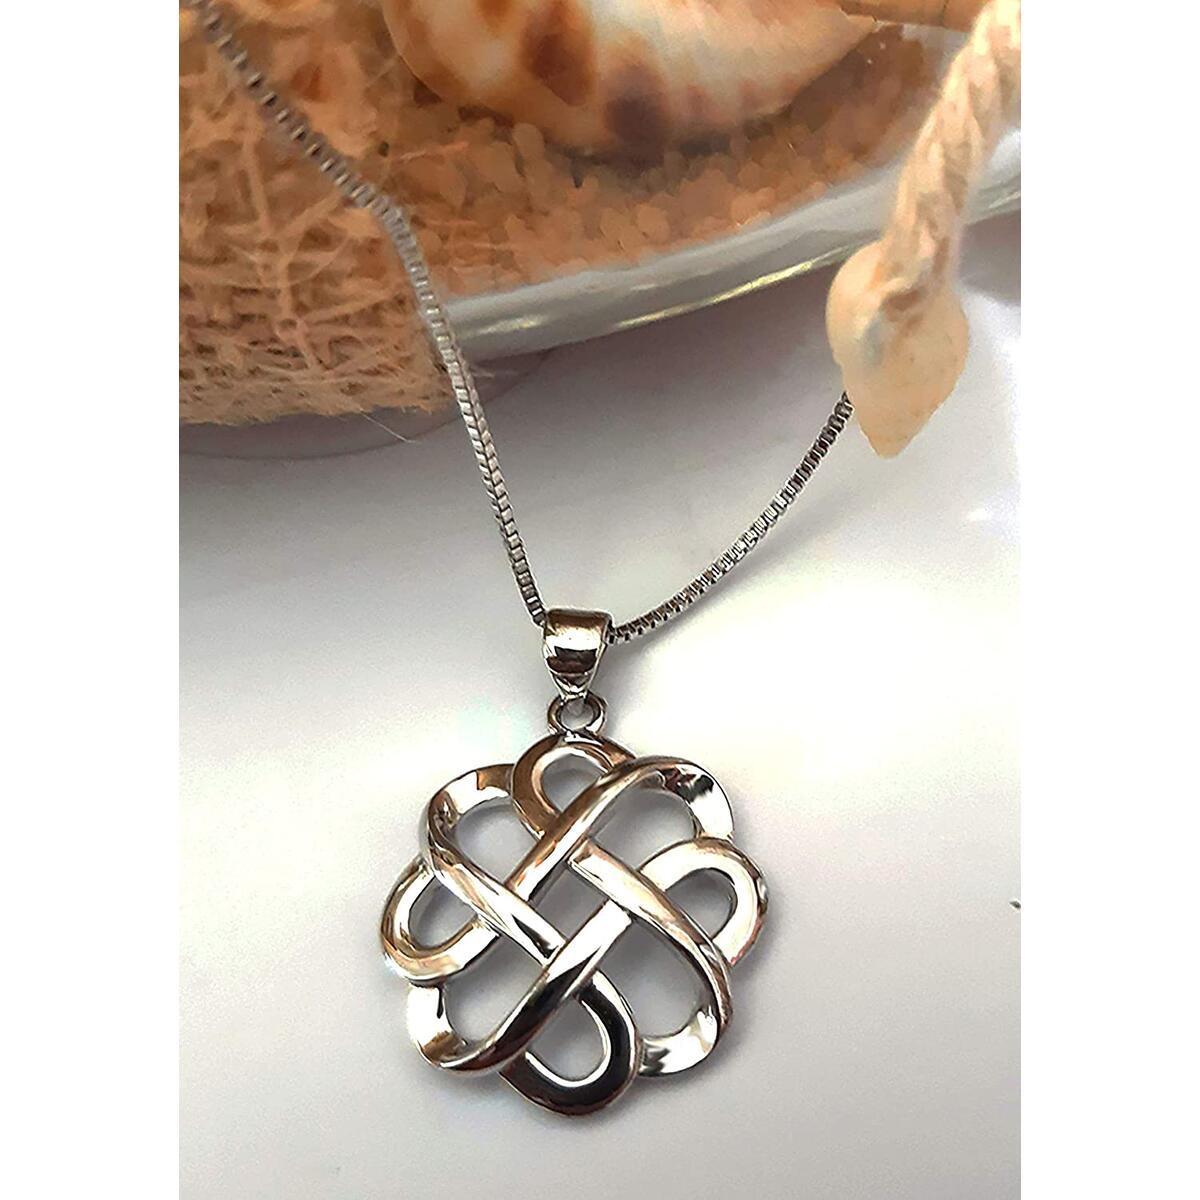 Quality Scape Women's Rhodium Plated Celtic Knot Pendant Necklace, 18